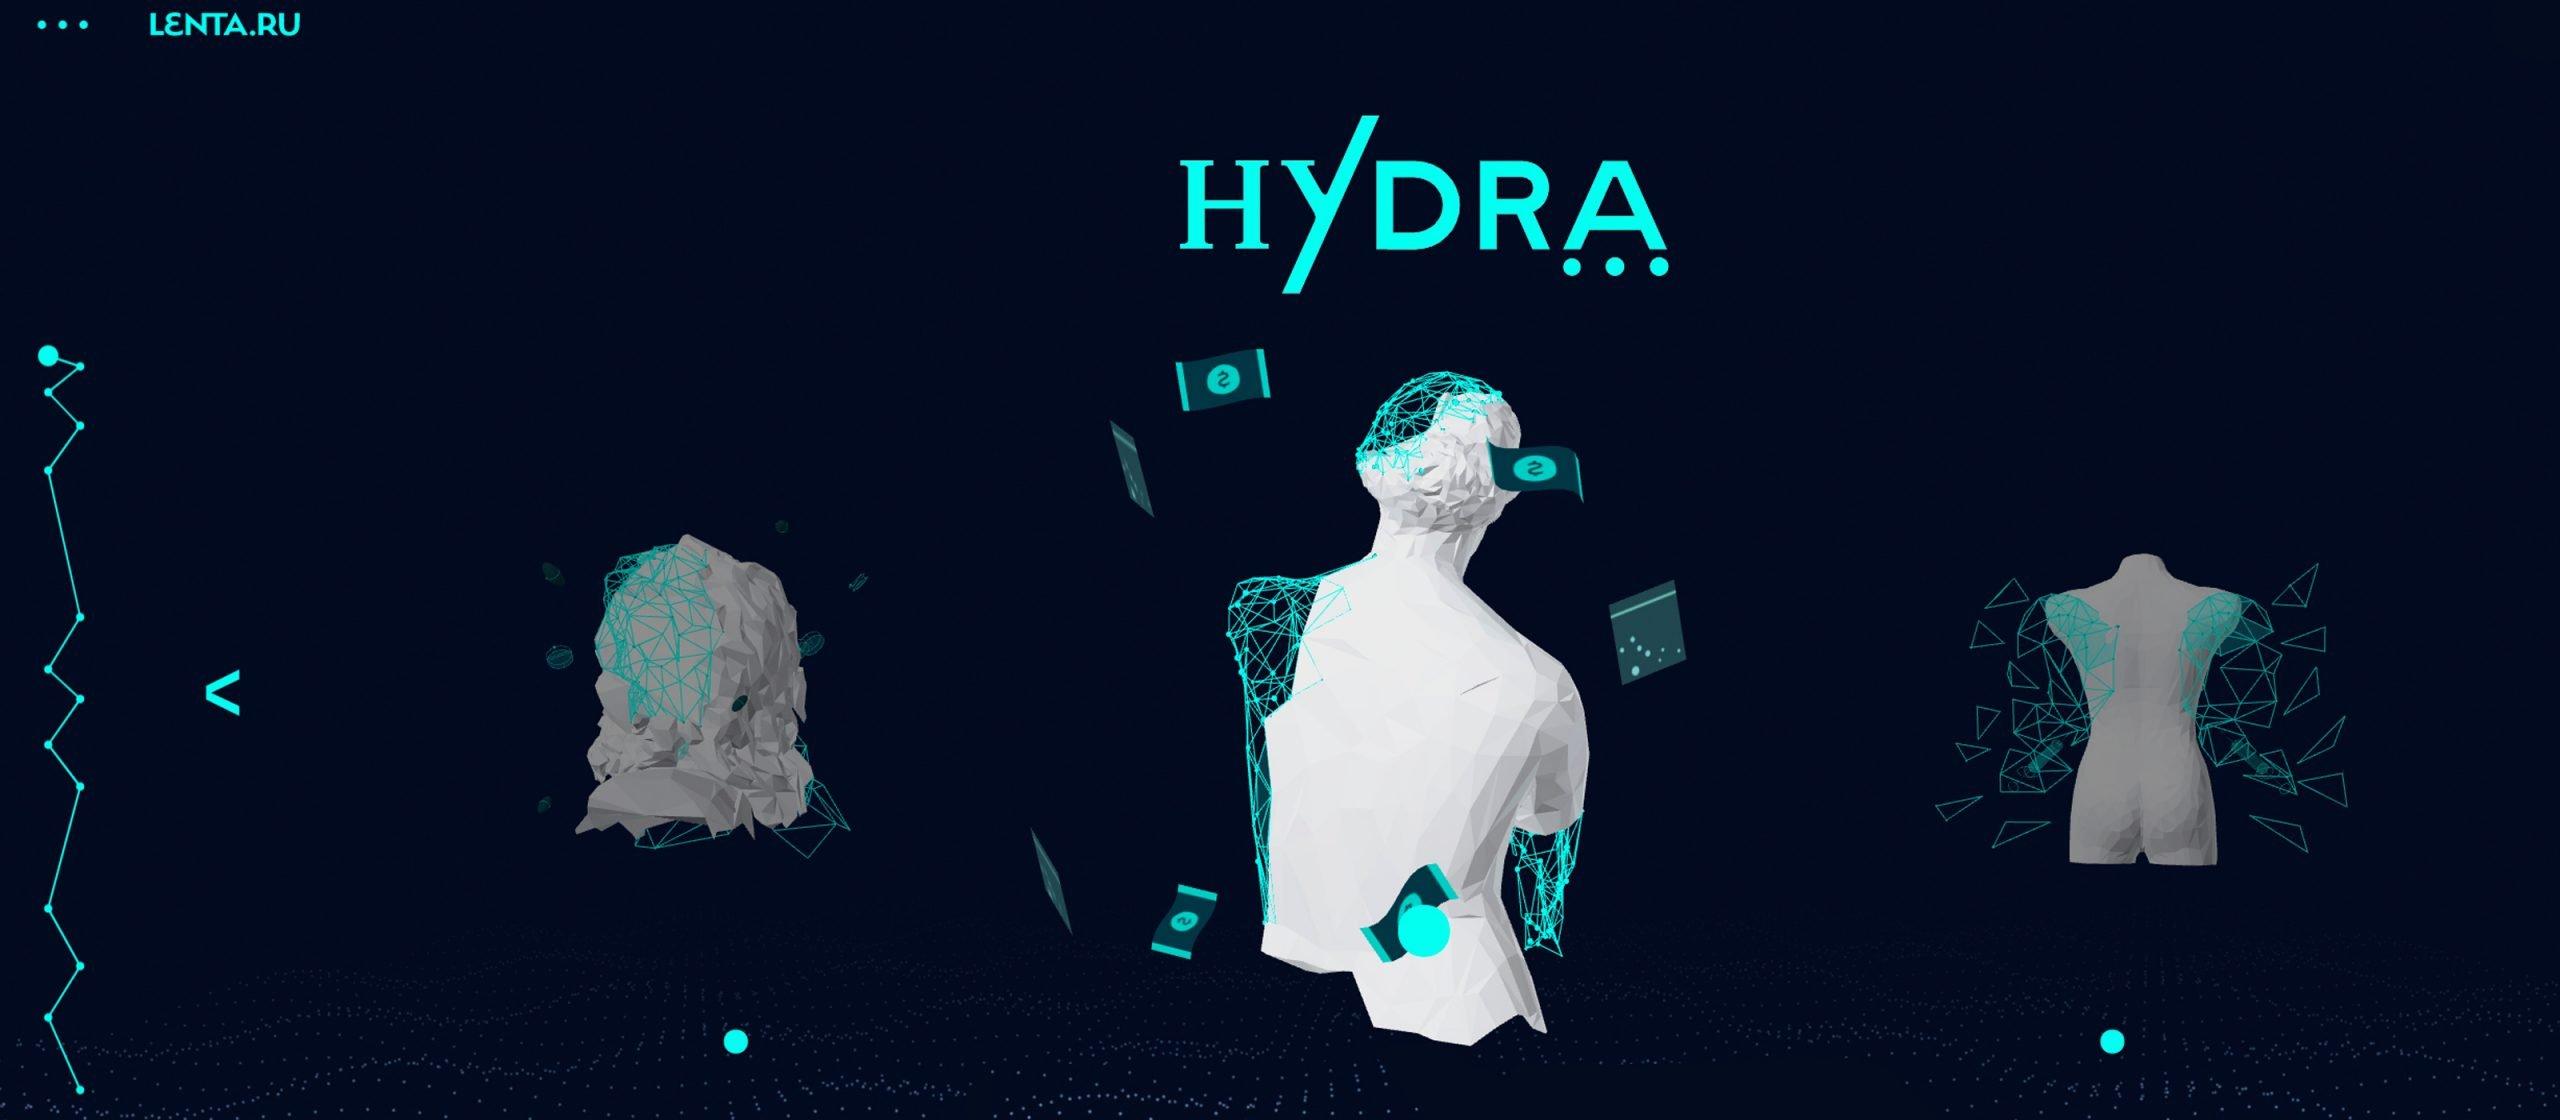 Russia's Hydra Darknet Marketplace Plans $146M Token Sale